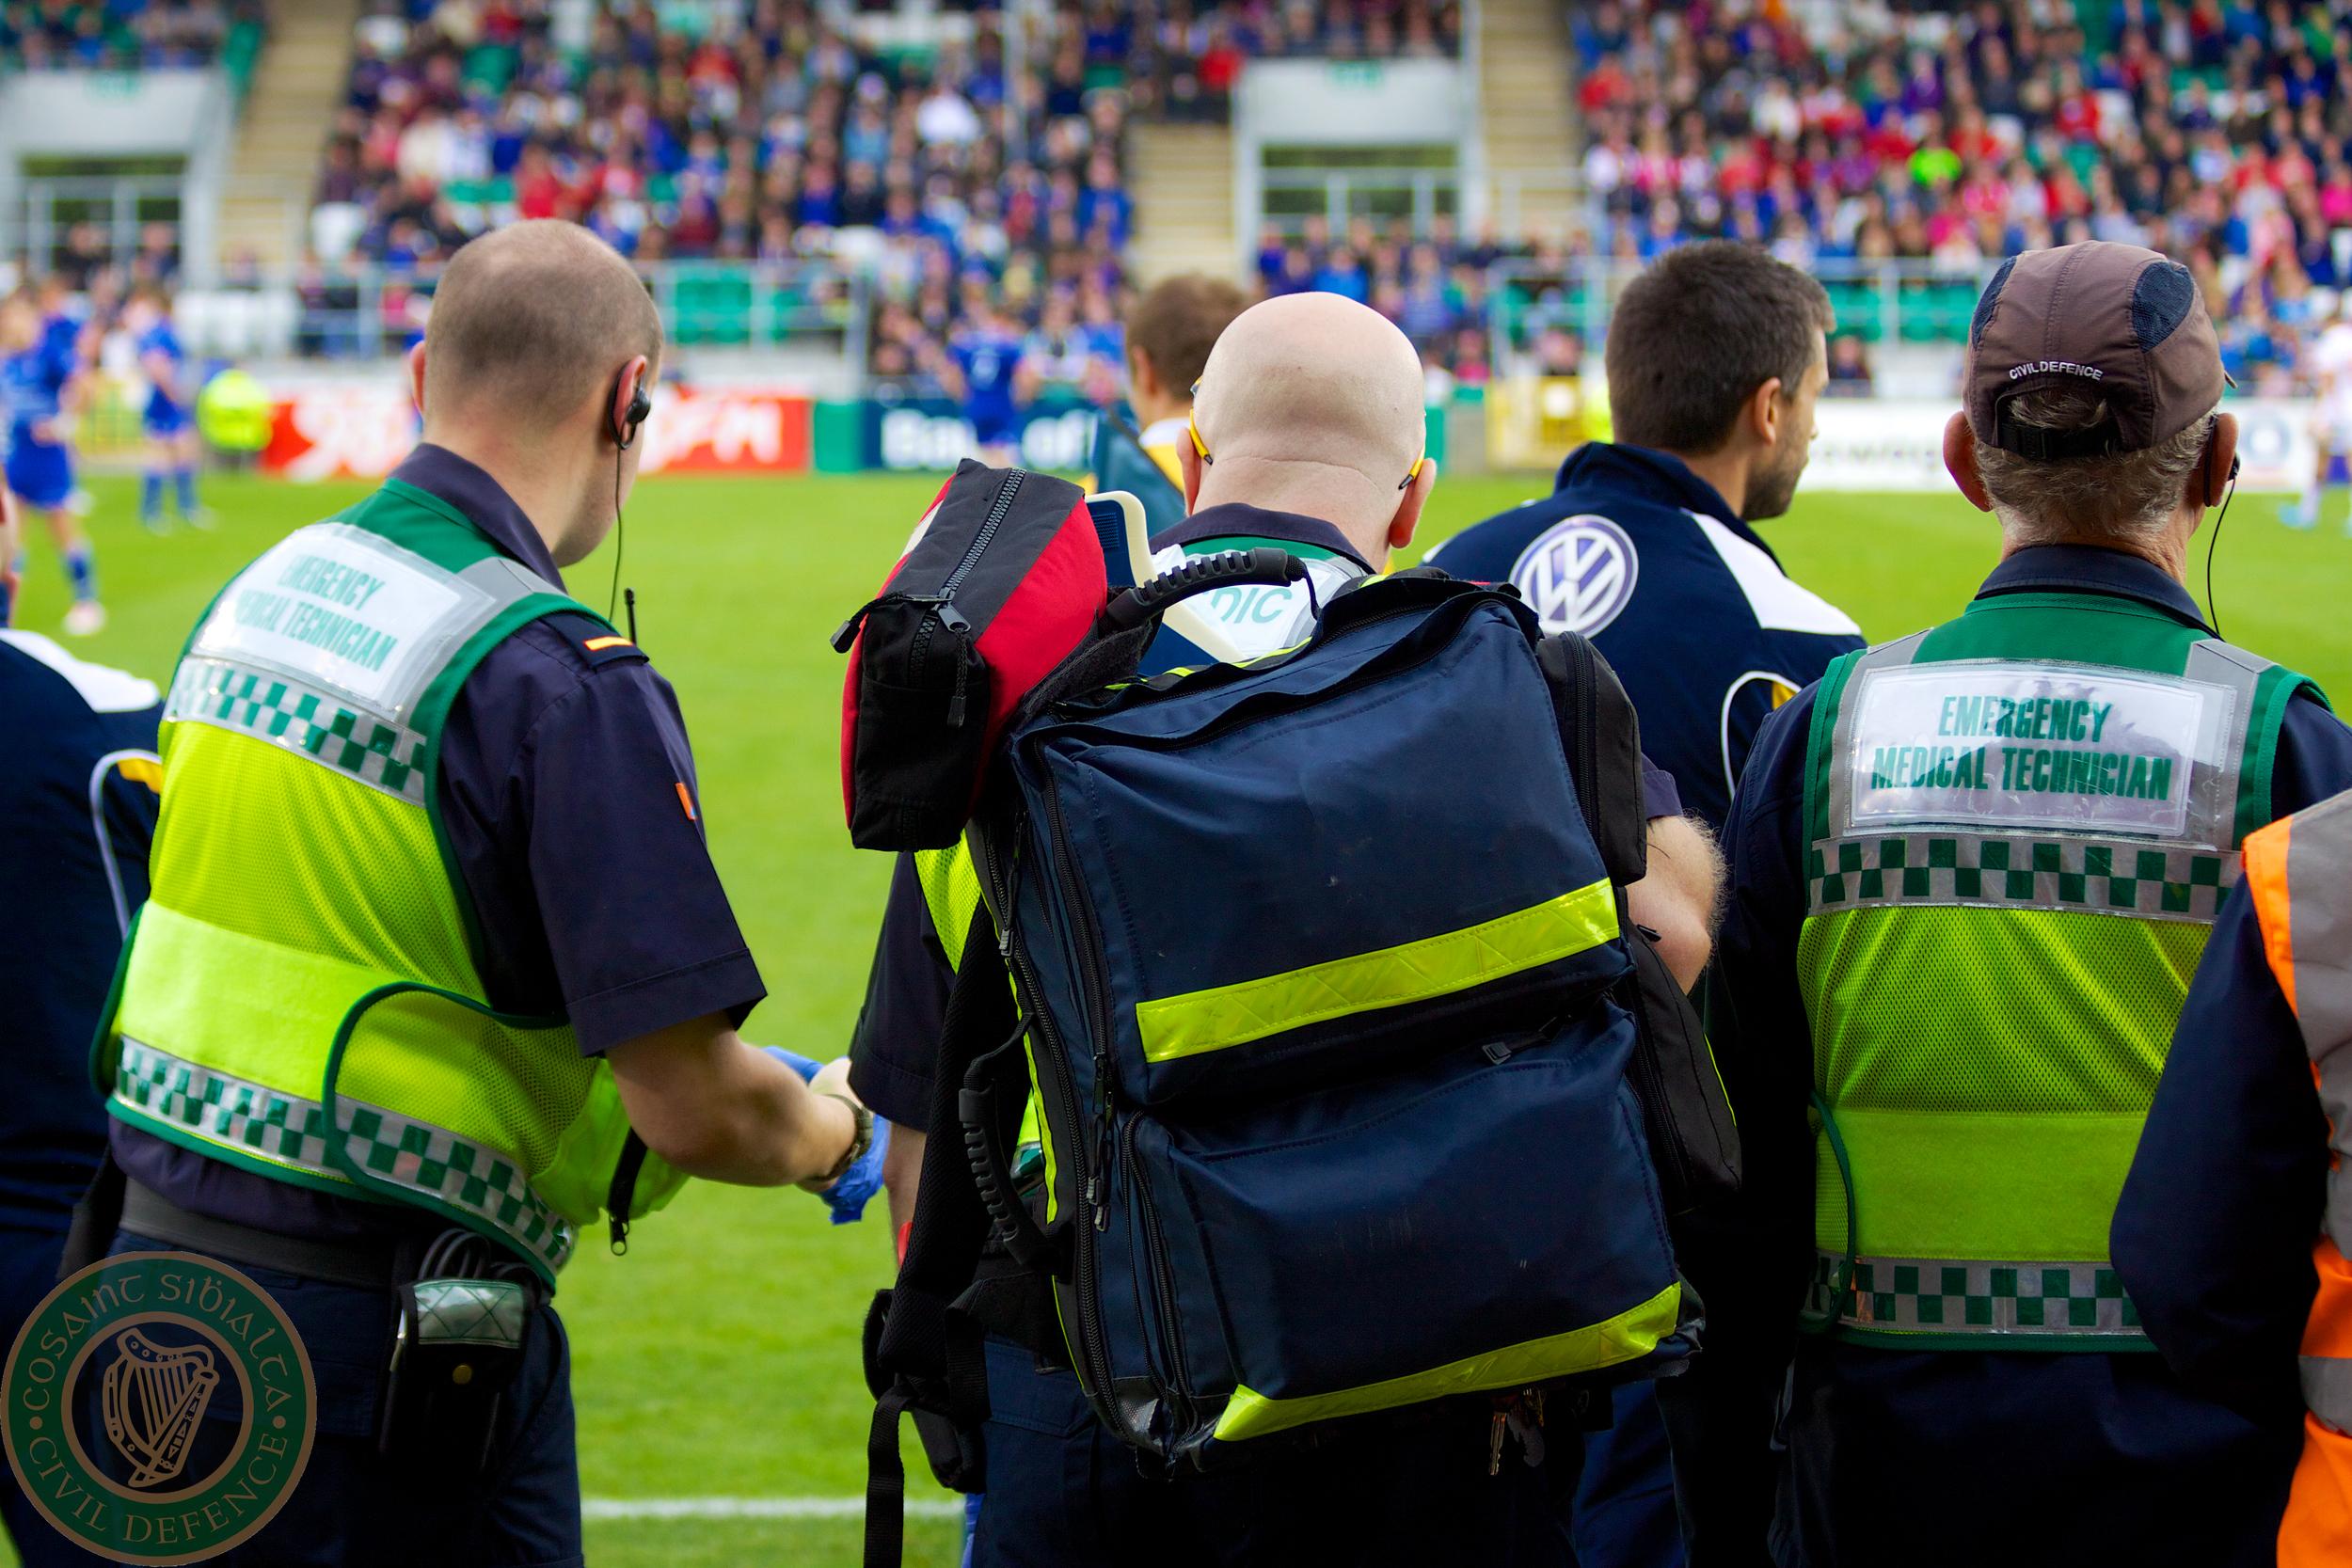 Civil Defence Medics at Leinster Game